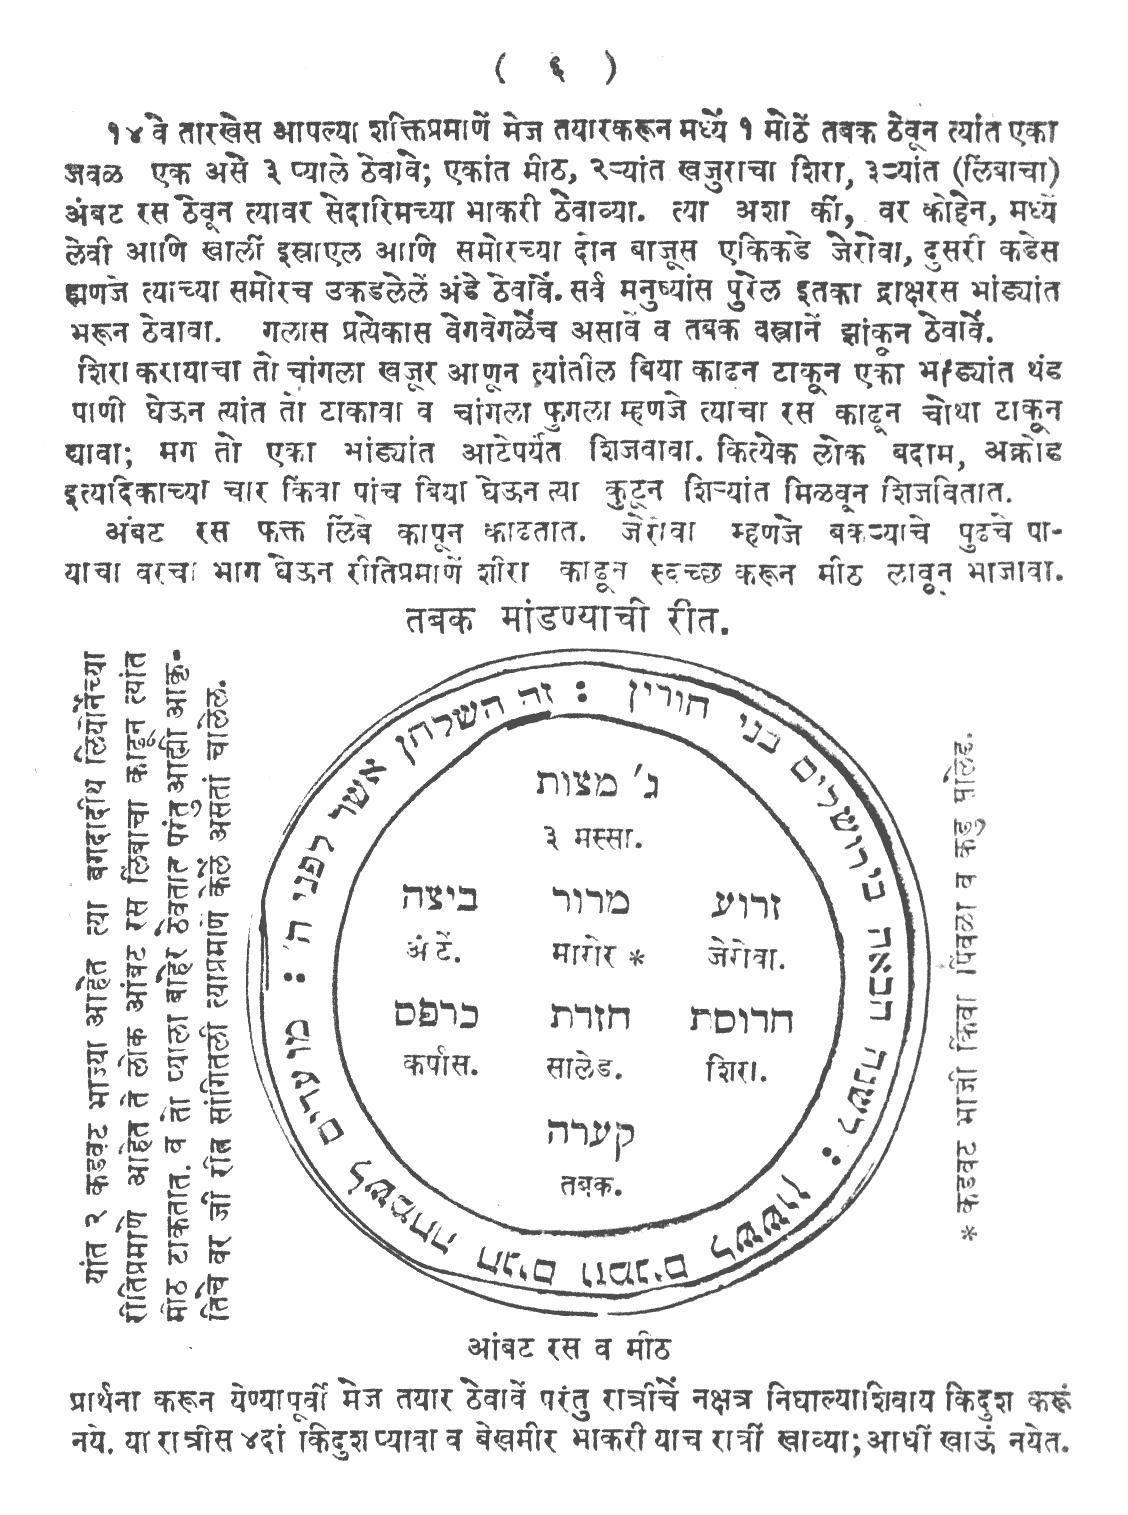 Judeo-Marathi - Wikipedia